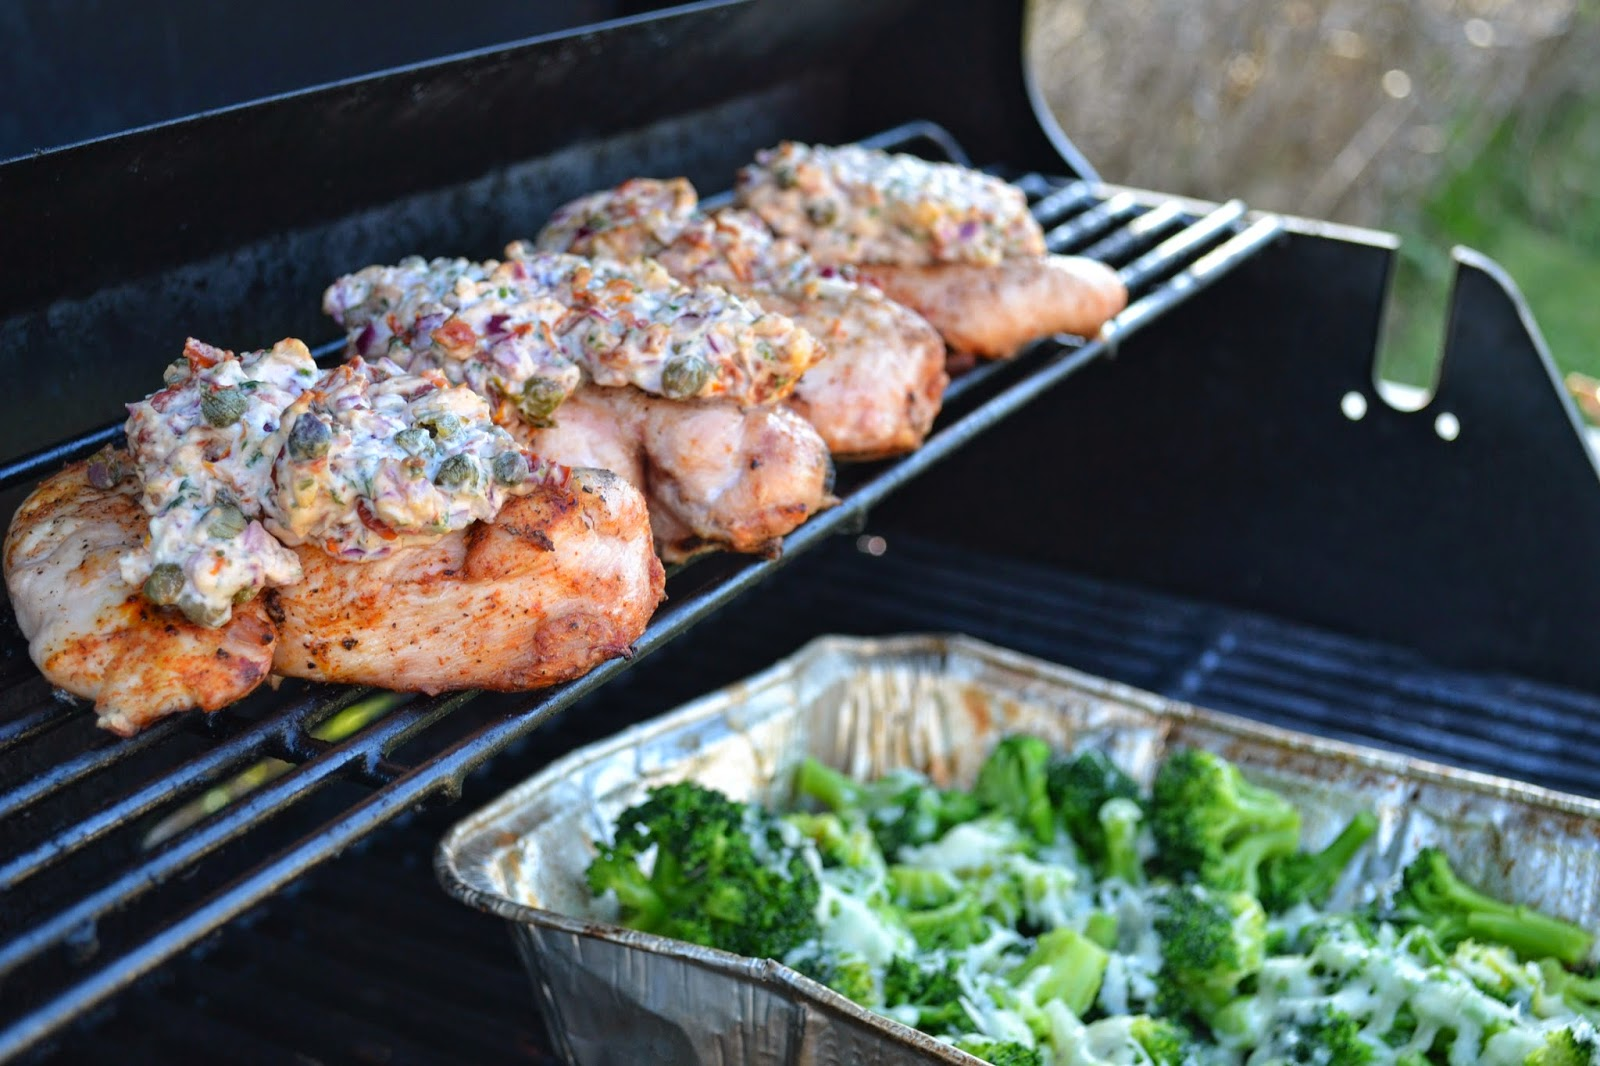 Torka kraver forsiktig grillning